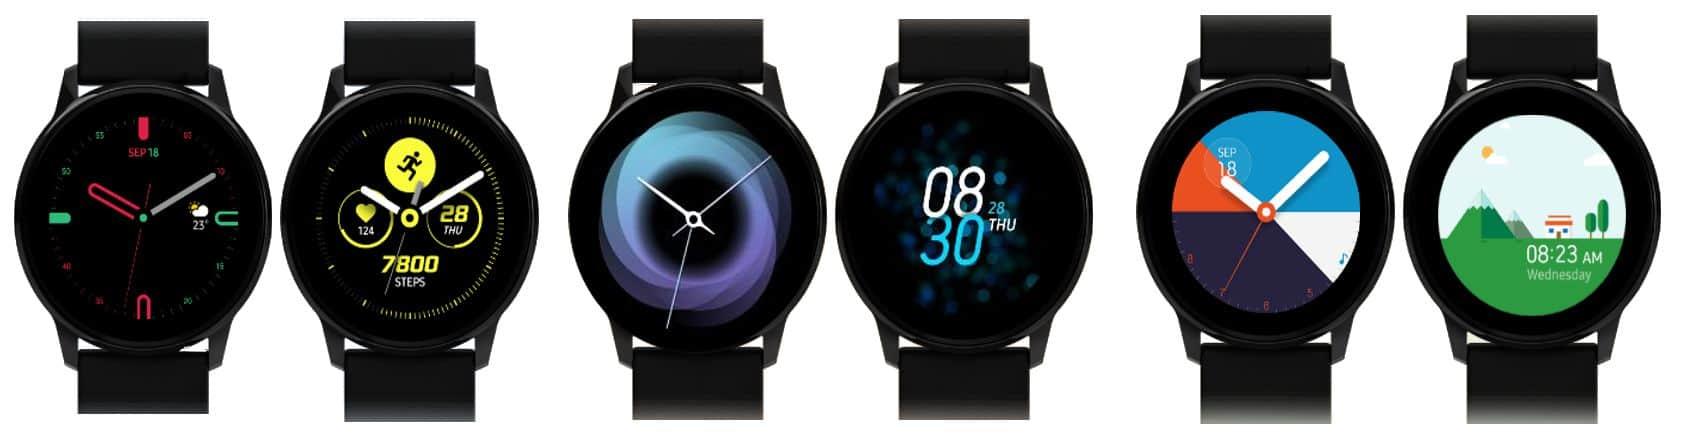 Samsung Galaxy Watch Active Watchfaces 1